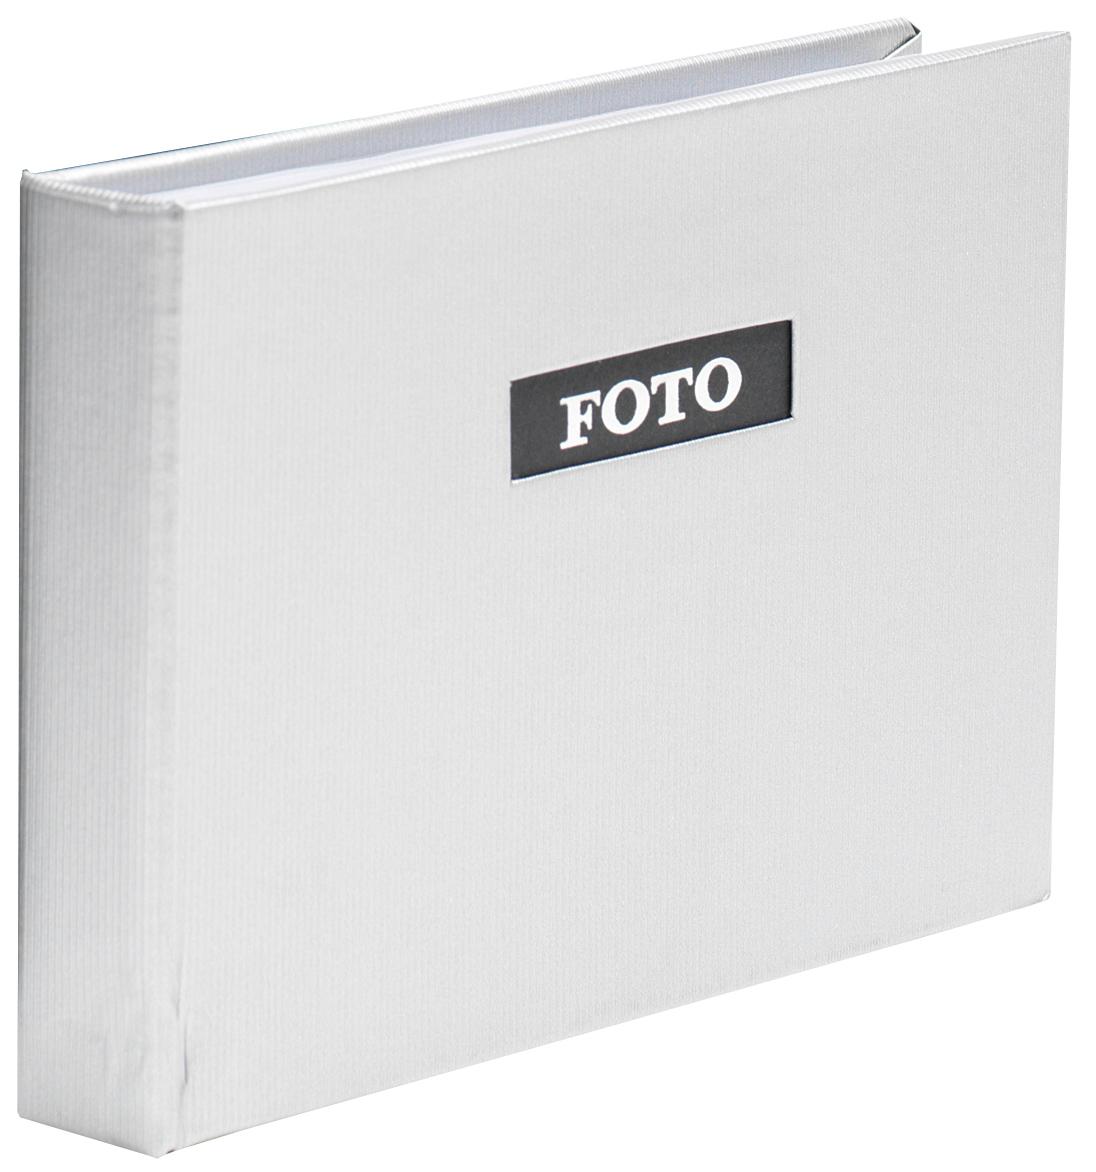 Trend line Album Pocket Silver - 40 Bilder i 10x15 cm - BGA Fotobutik ca885511c28f